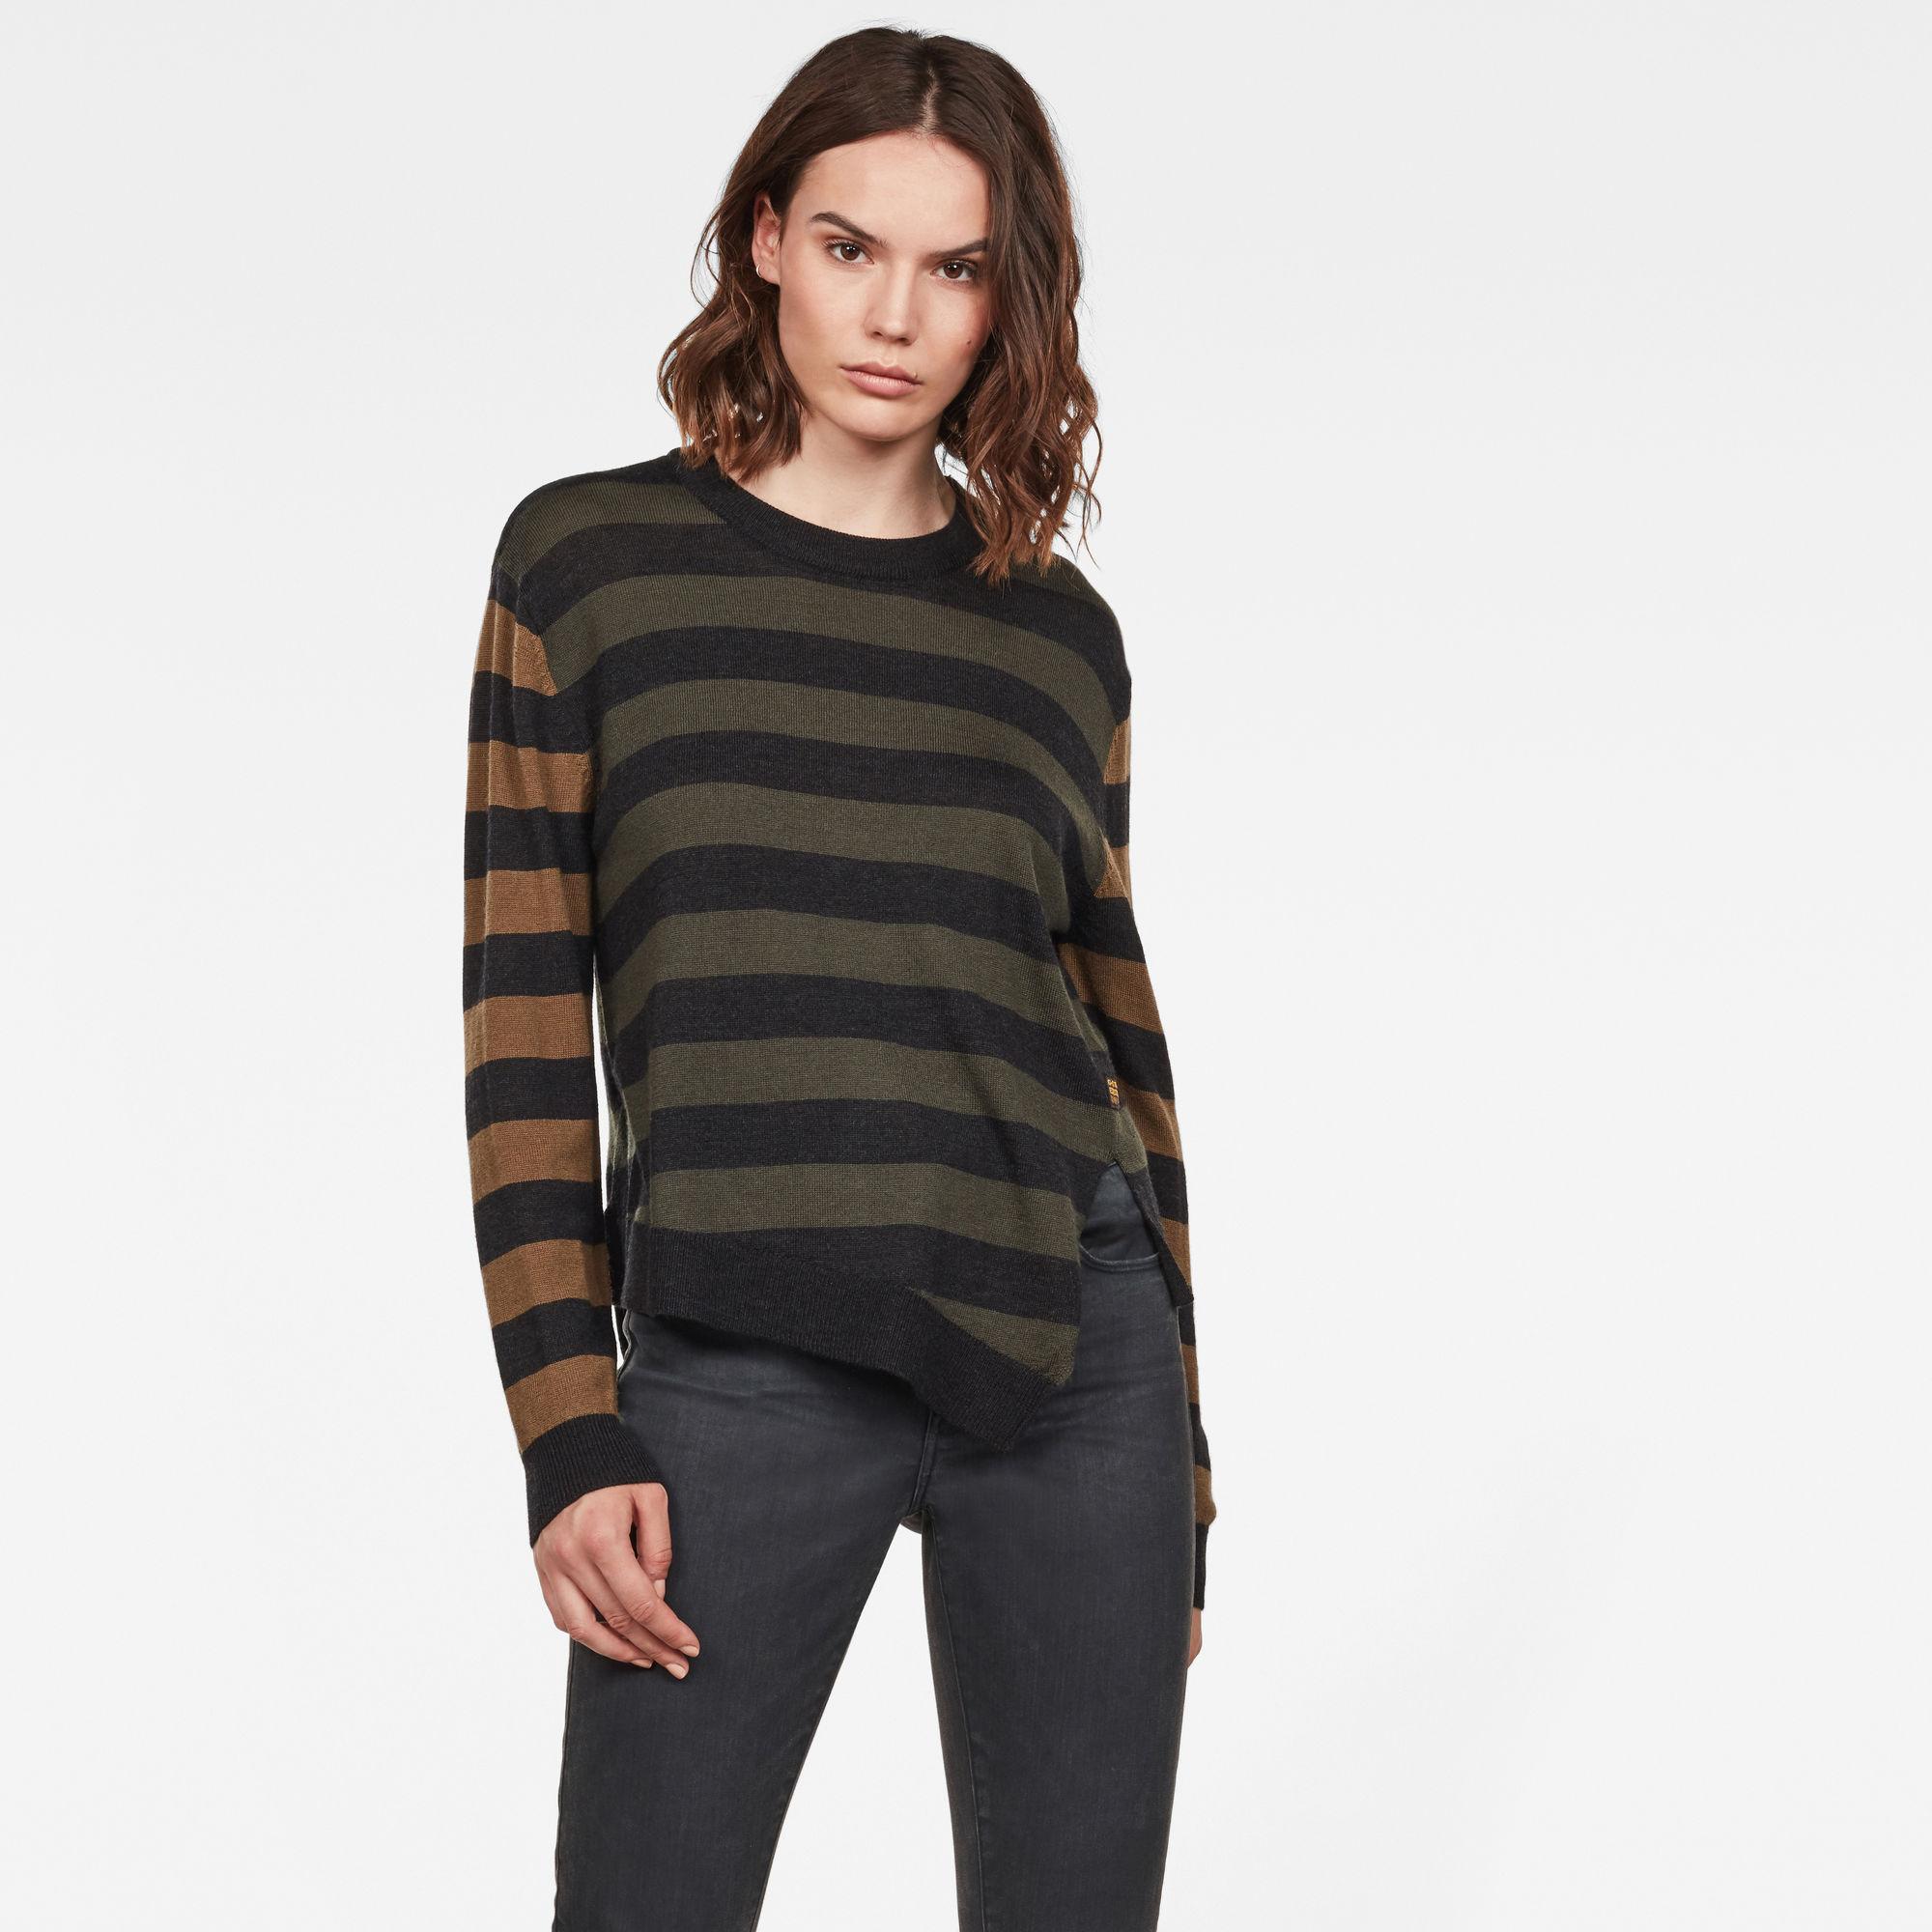 G-Star RAW Dames Asymmetrical Knitted Sweater Groen